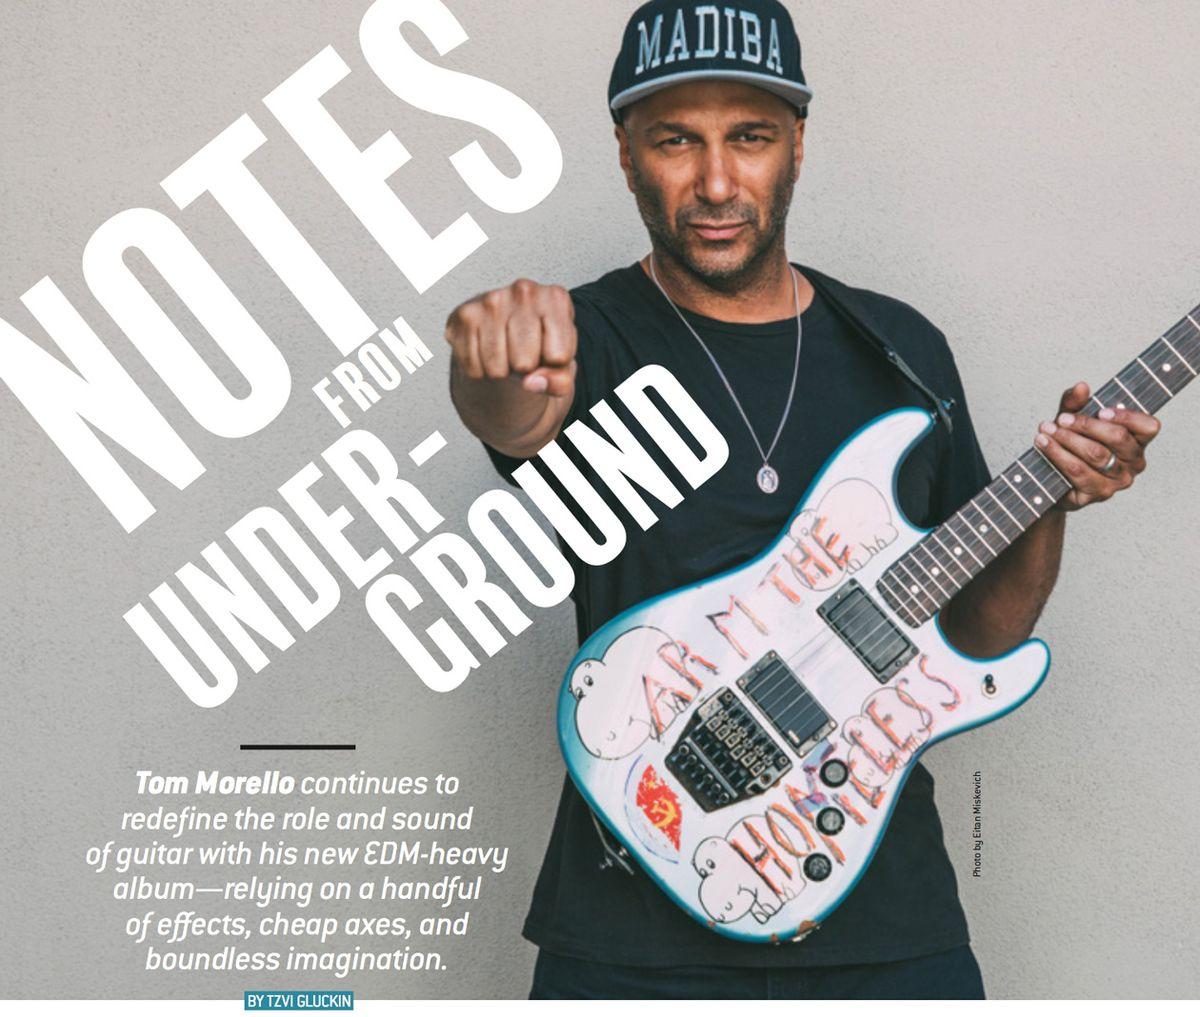 Tom Morello's 'The Atlas Underground'